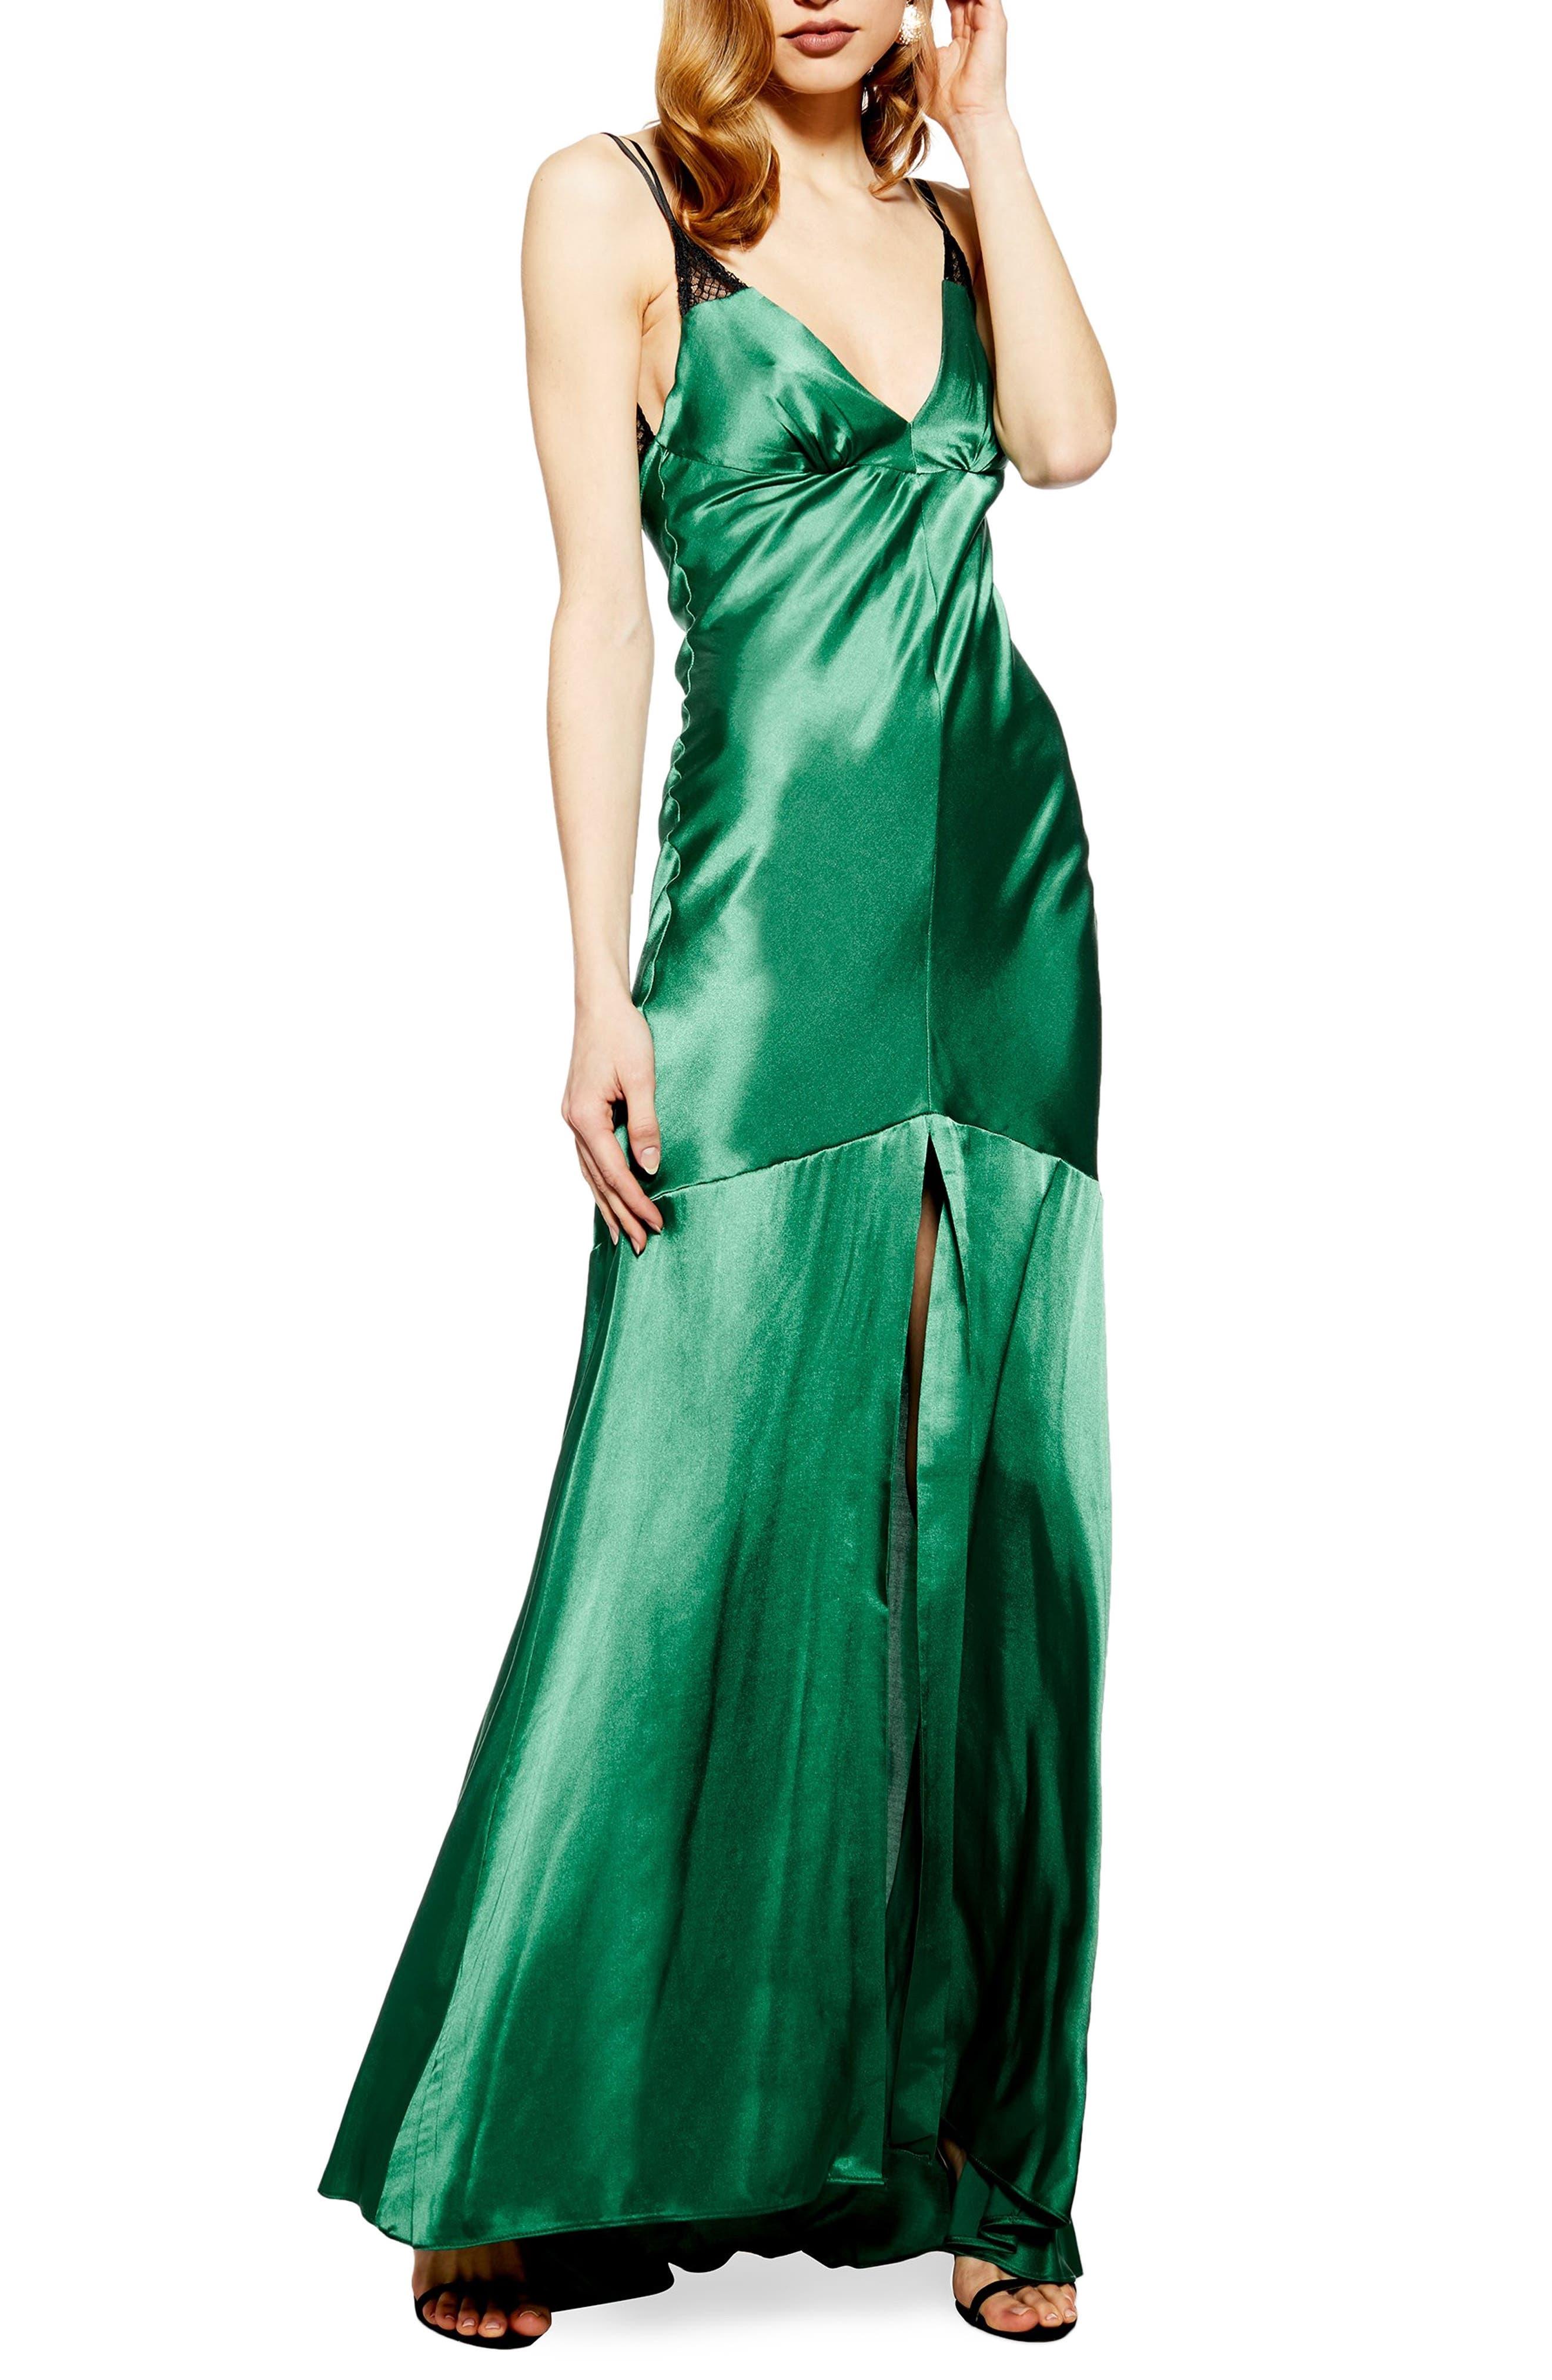 Topshop Lace Satin Maxi Dress, US (fits like 16-18) - Green